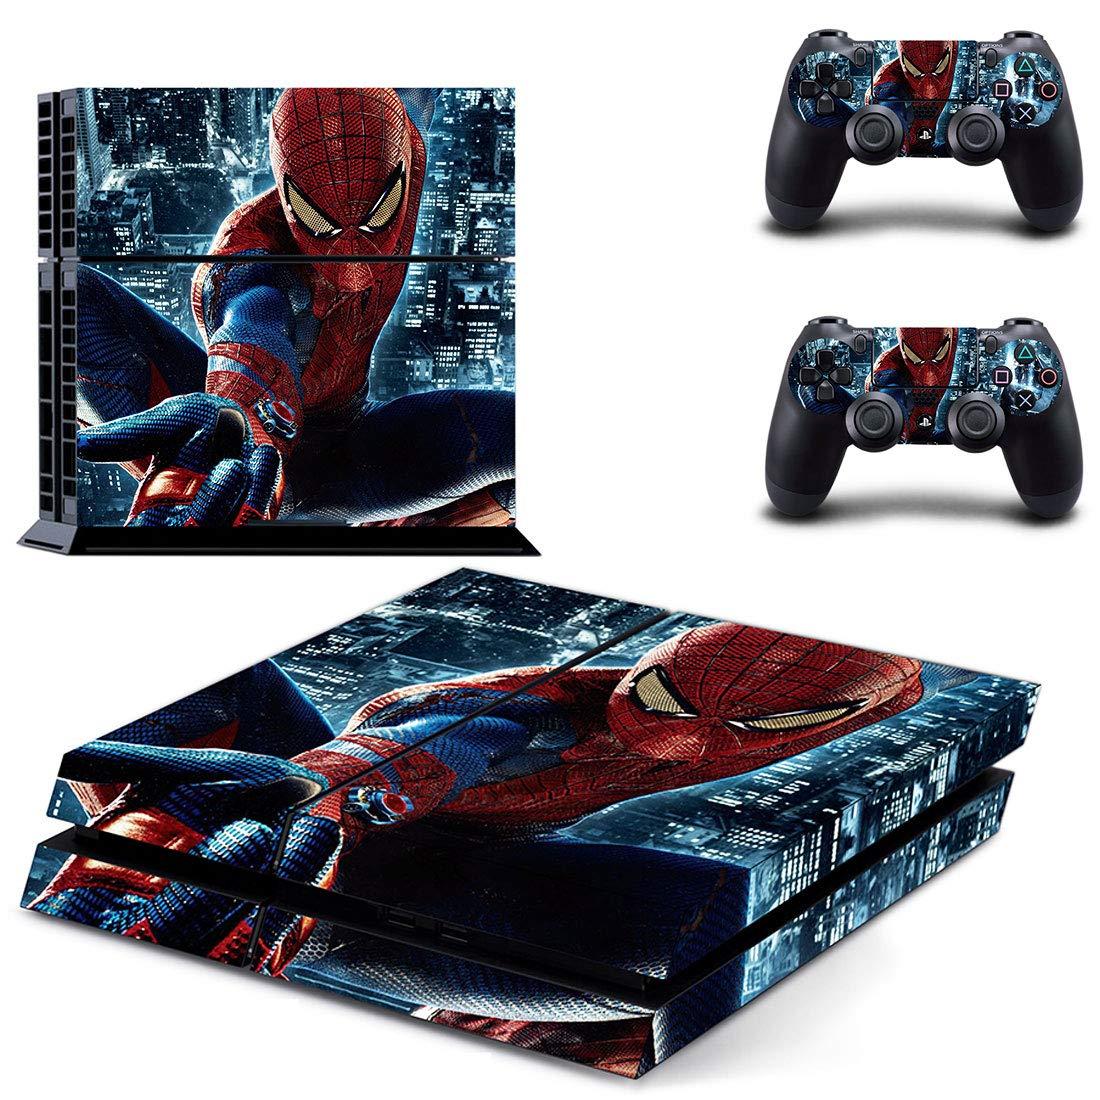 Adventure Games - PS4 ORIGINAL - Spiderman - Playstation 4 Vinyl Console Skin Decal Sticker + 2 Controller Skins Set